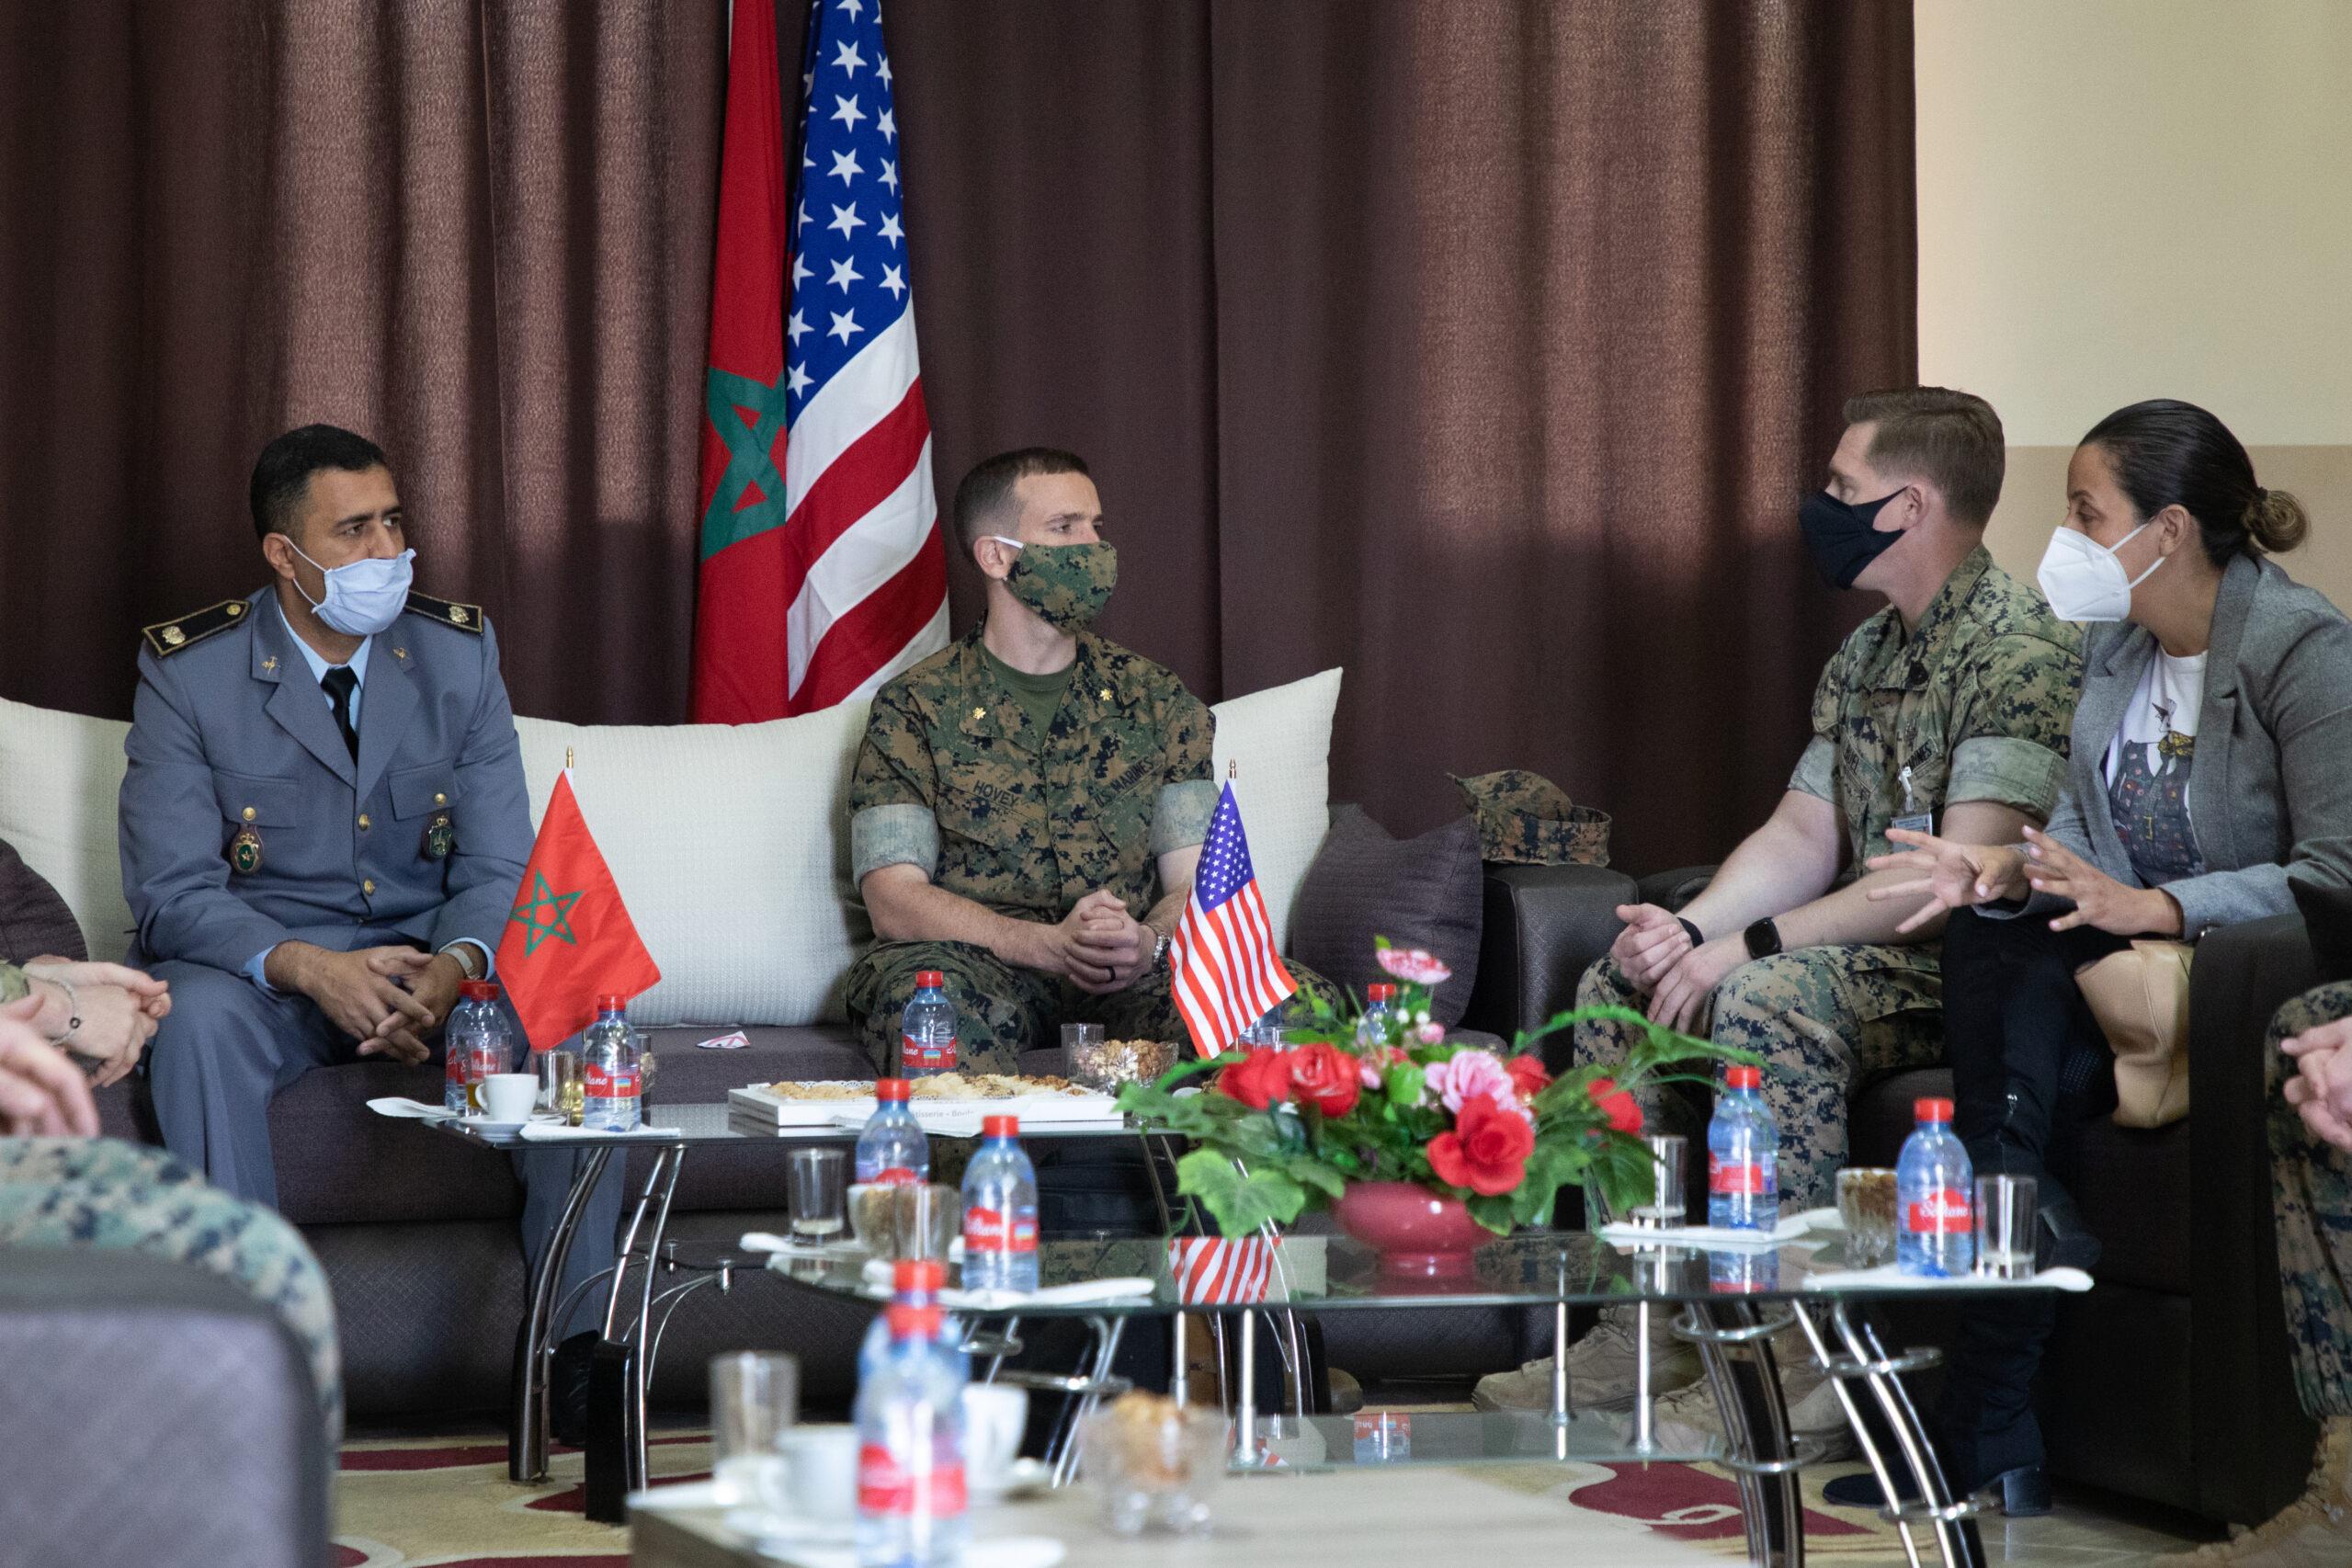 Cooperation militaire avec les USA - Page 9 21031912